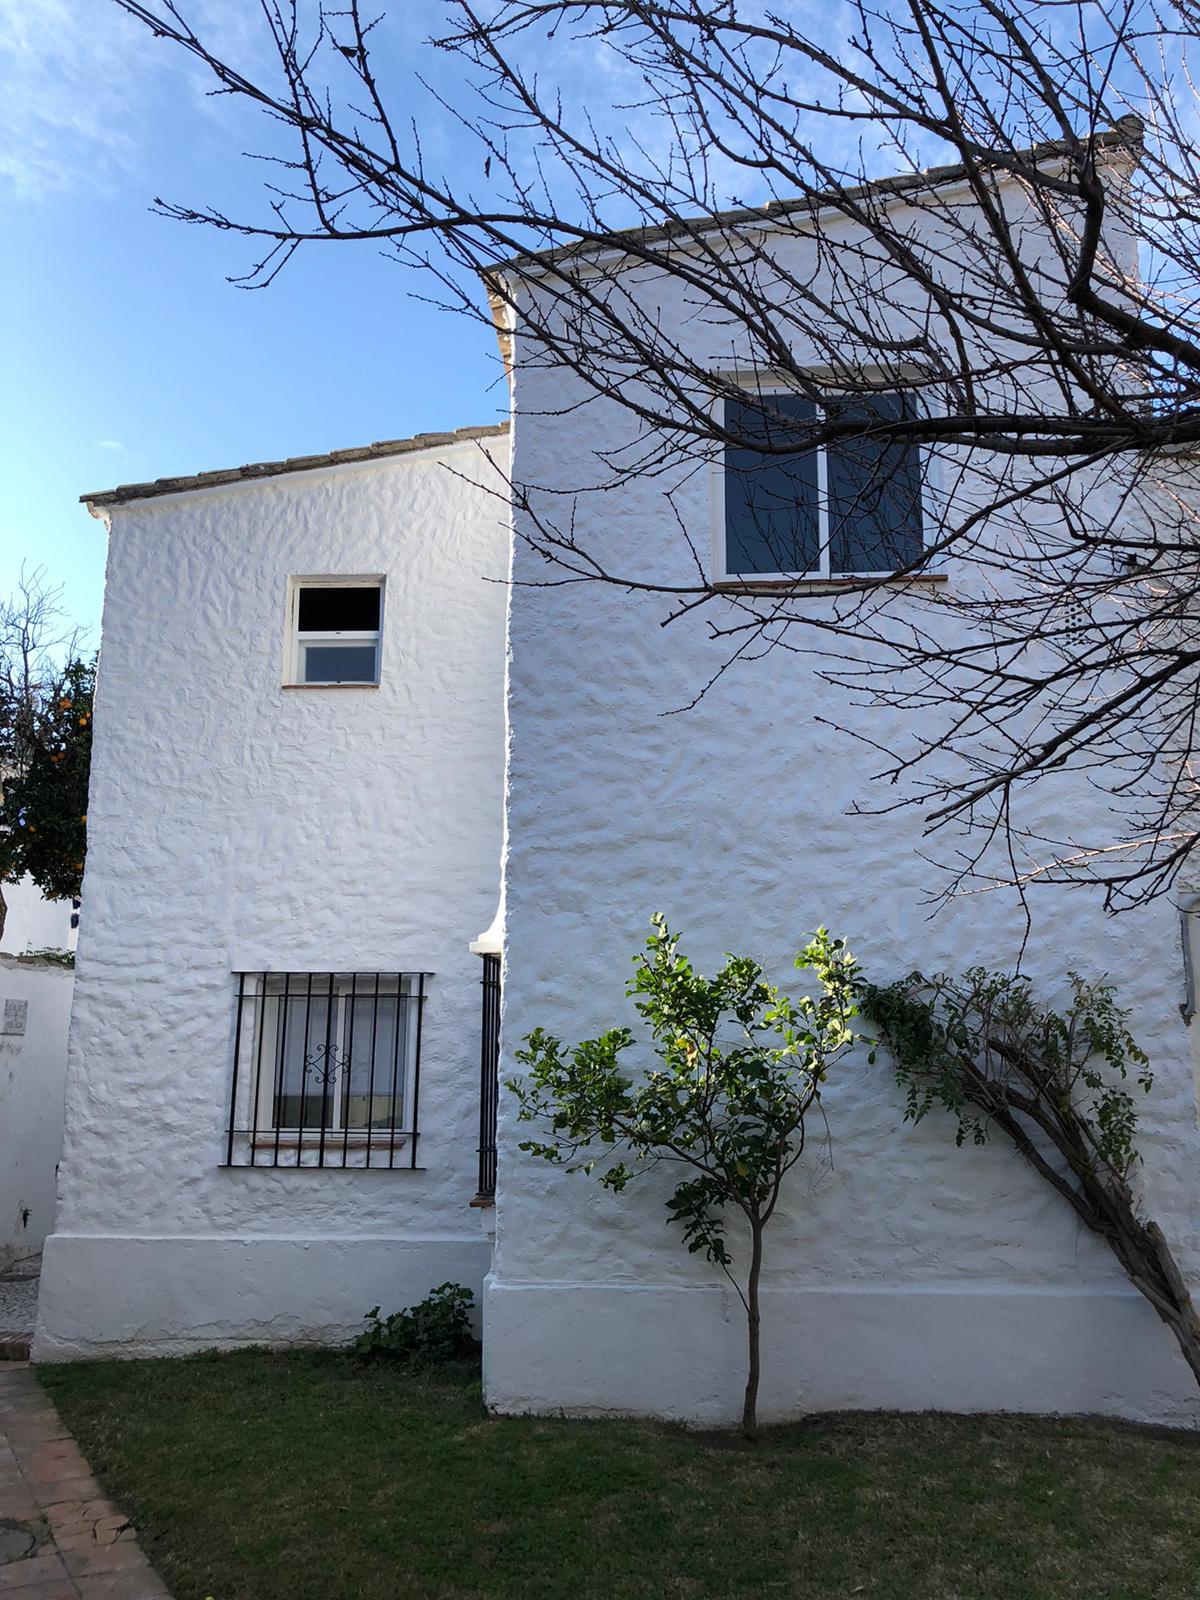 4 Bedroom Townhouse For Sale Carib Playa, Costa del Sol - HP3673892